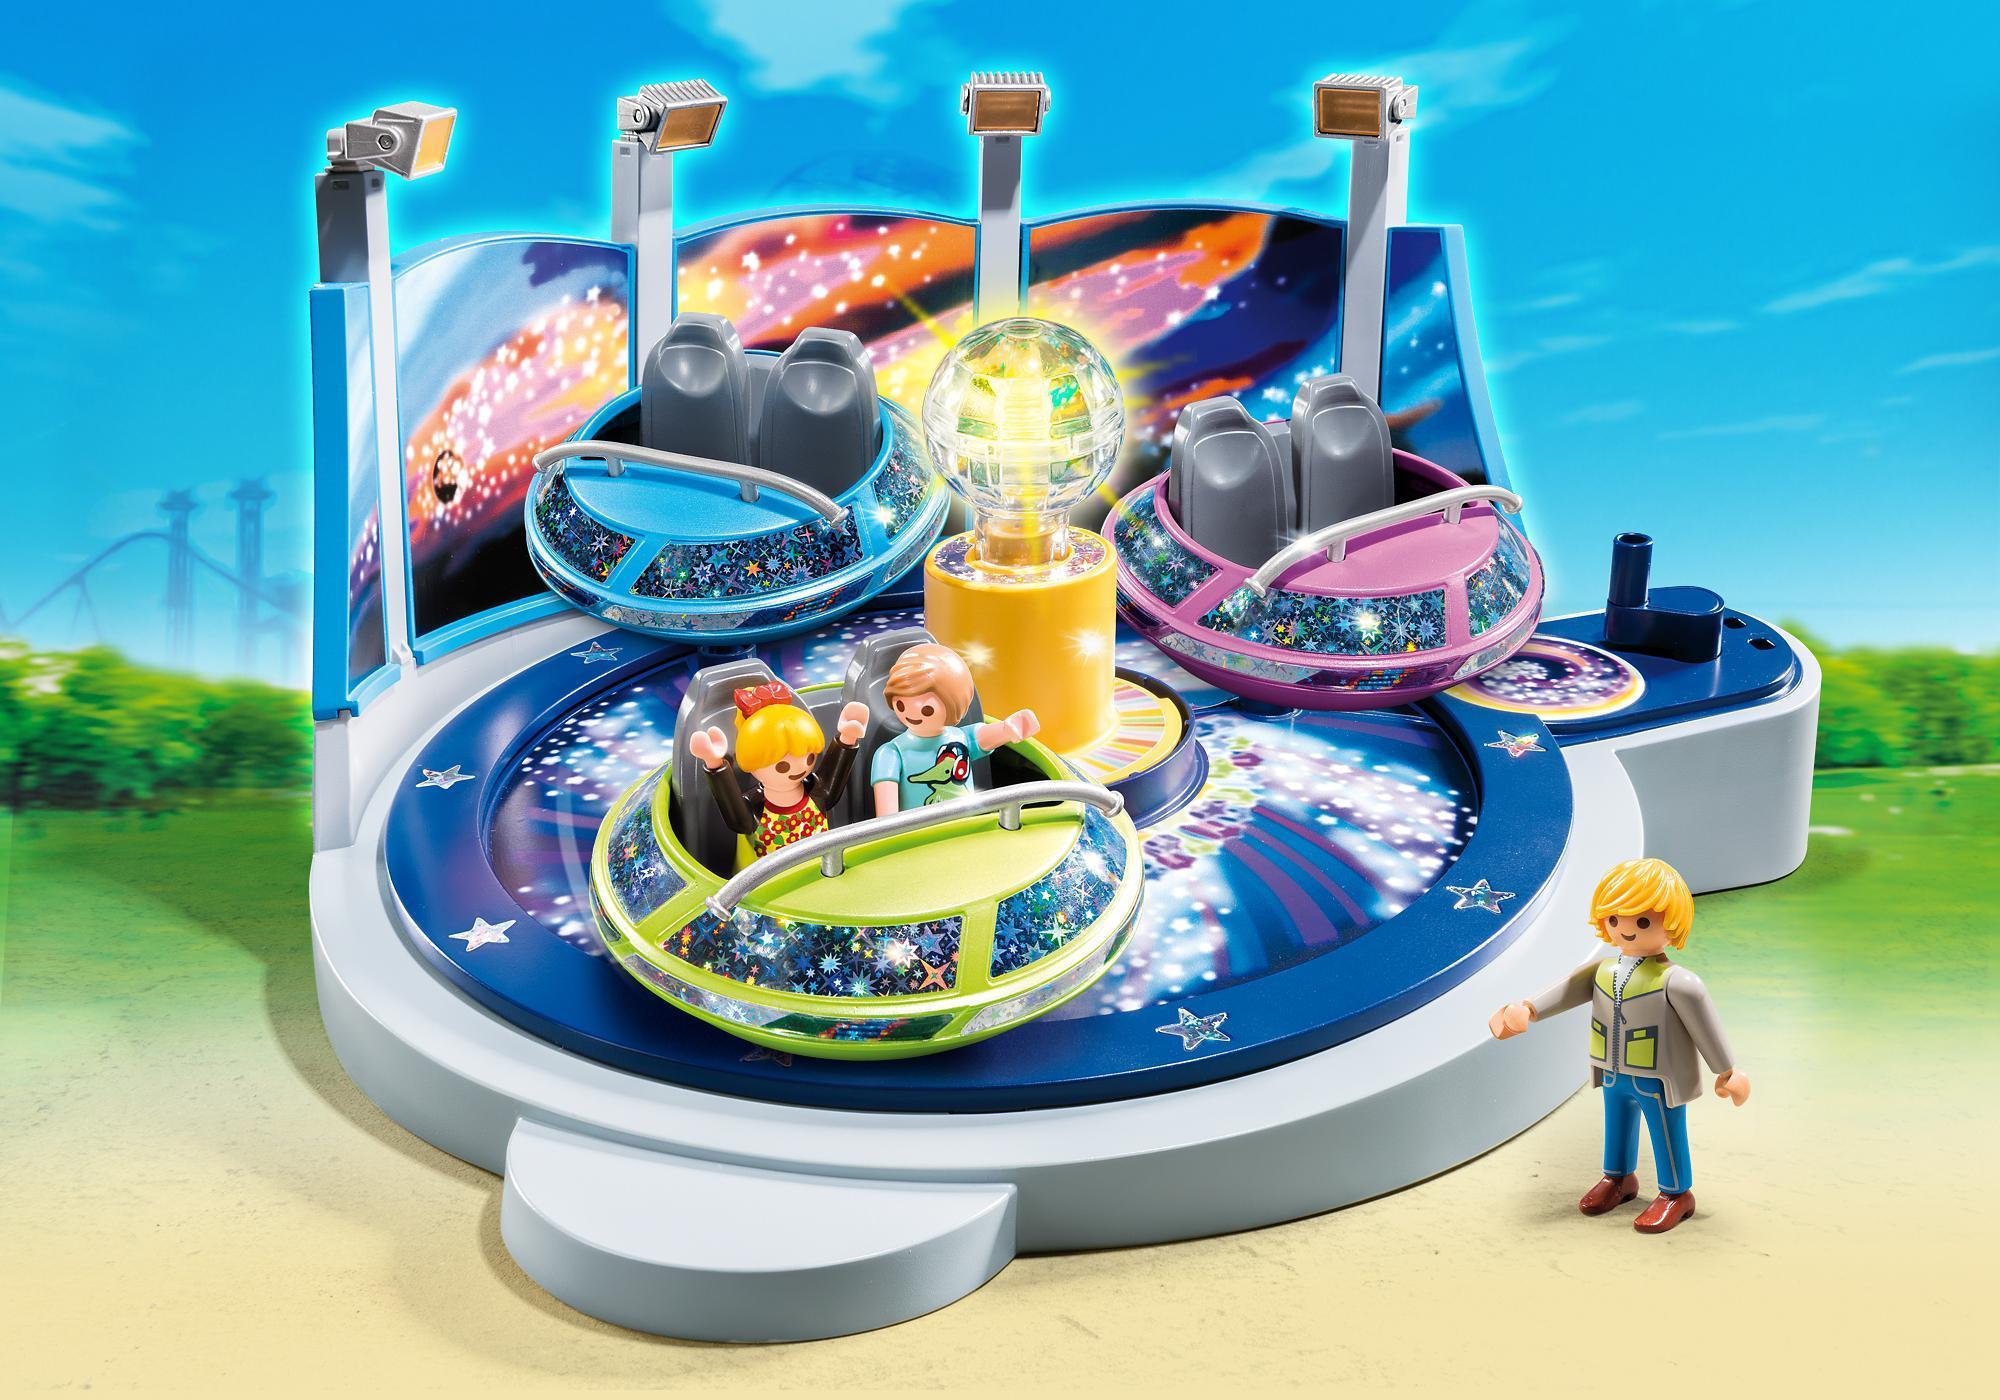 http://media.playmobil.com/i/playmobil/5554_product_detail/Breakdancer mit Lichteffekten